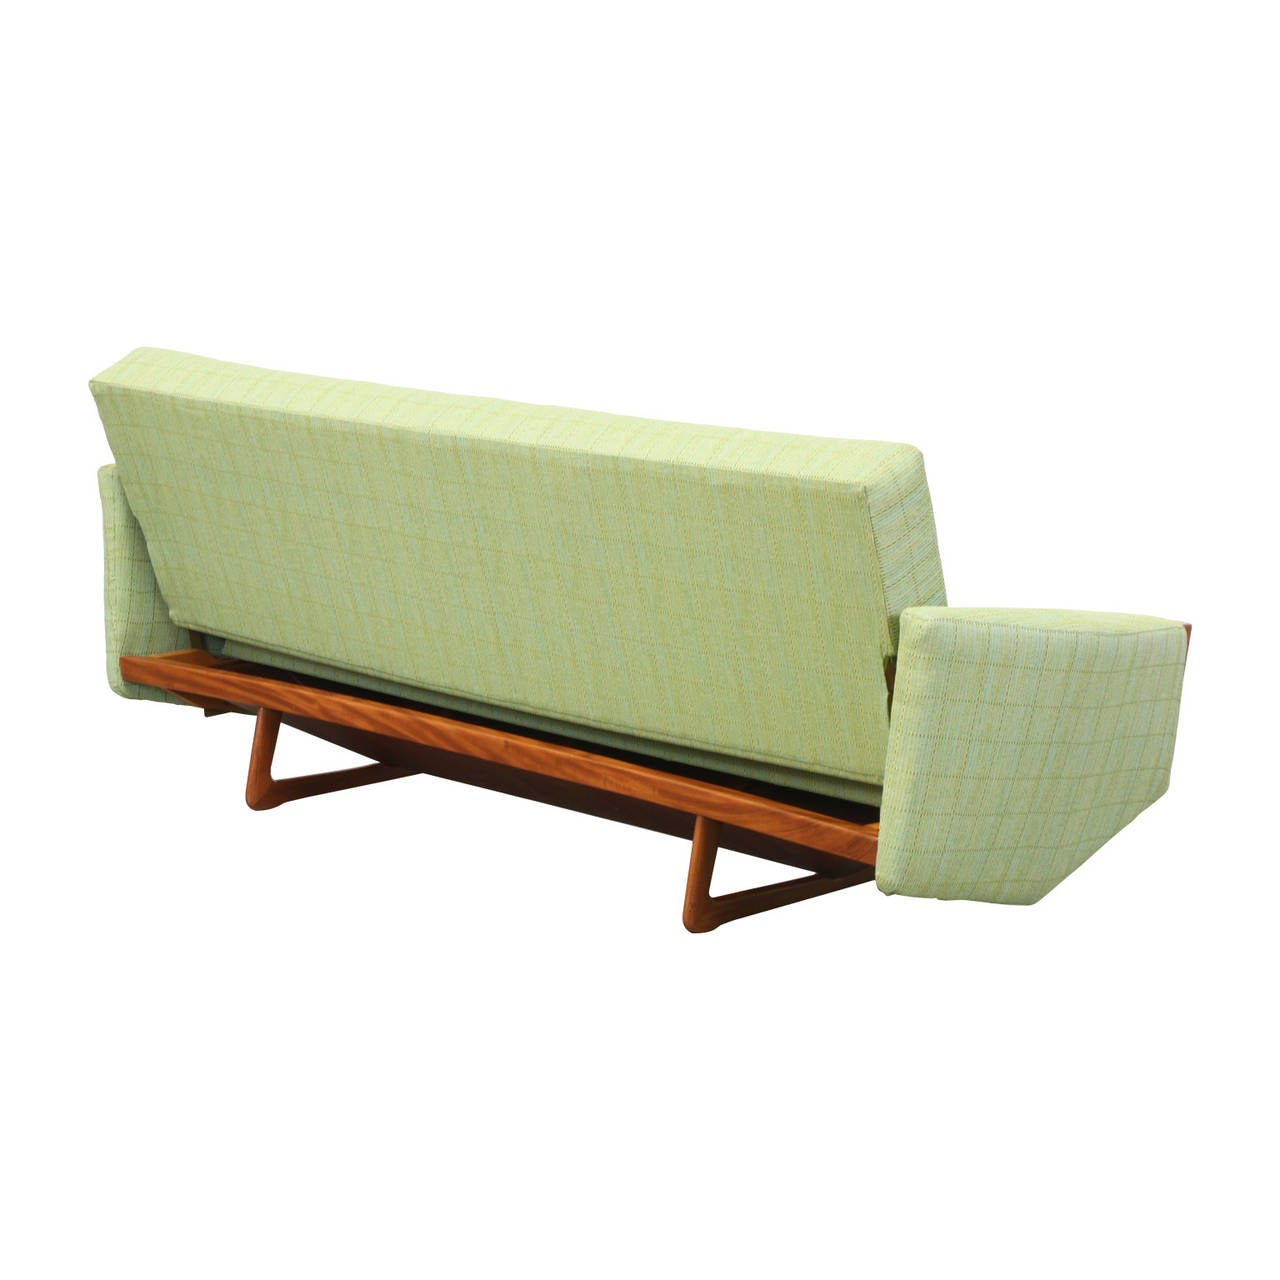 danish modern sofa bed rowe nantucket slipcover teak at 1stdibs